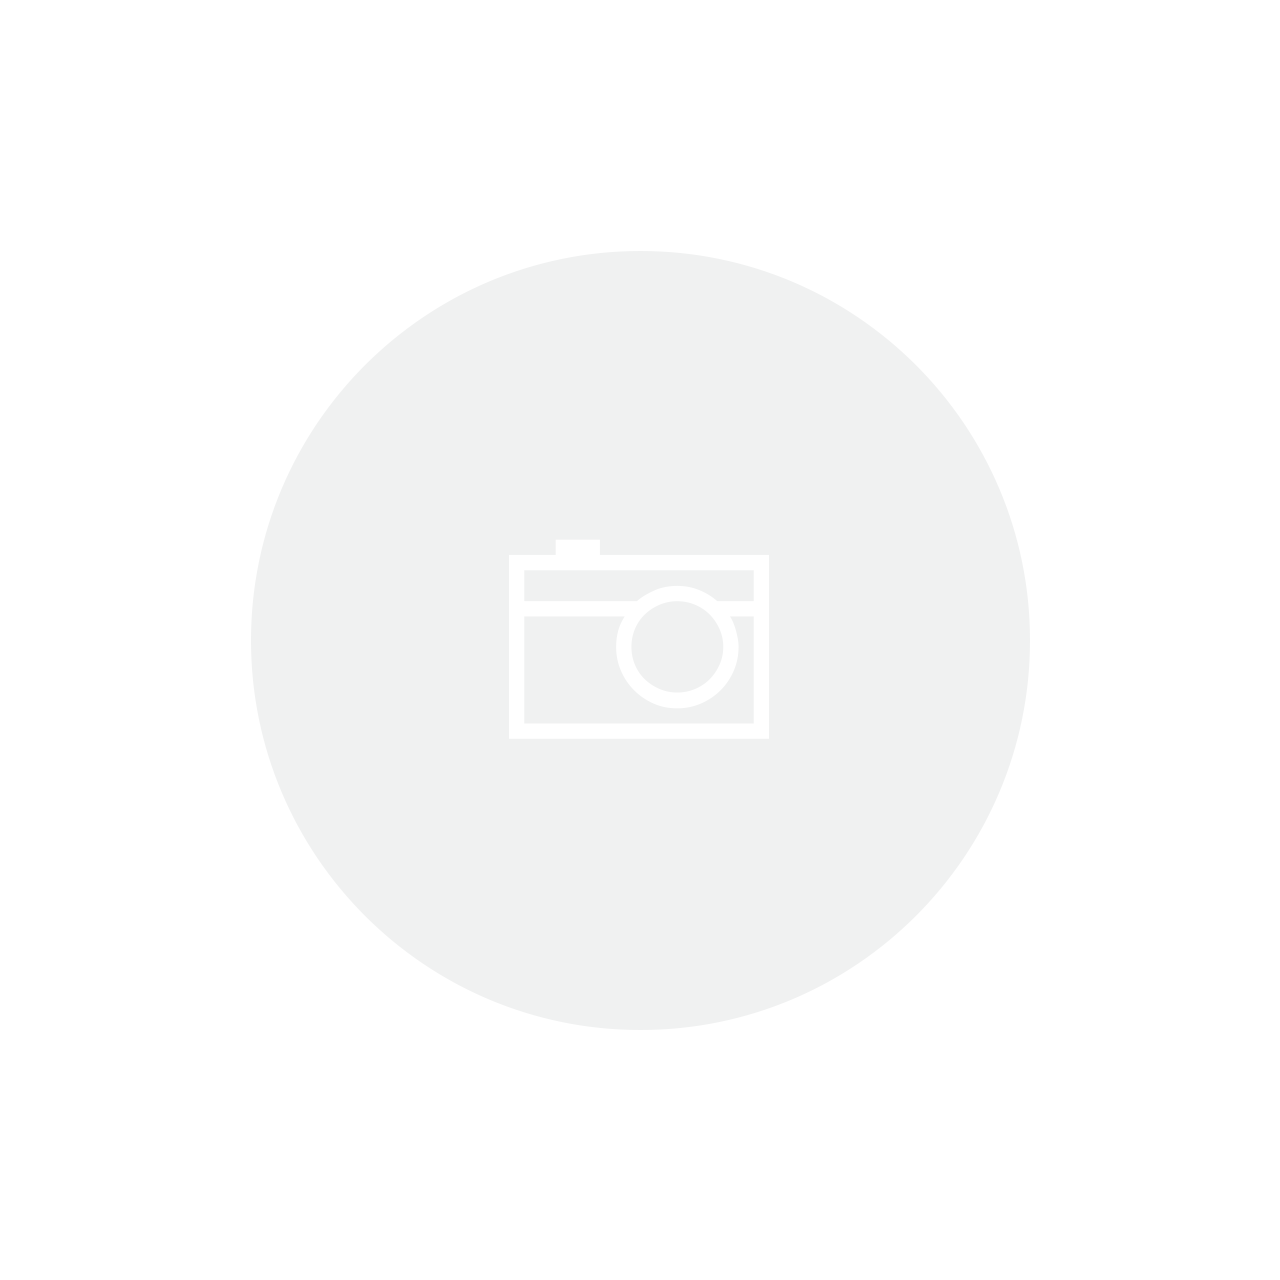 Jogo Americano Redondo Branco 38 cm